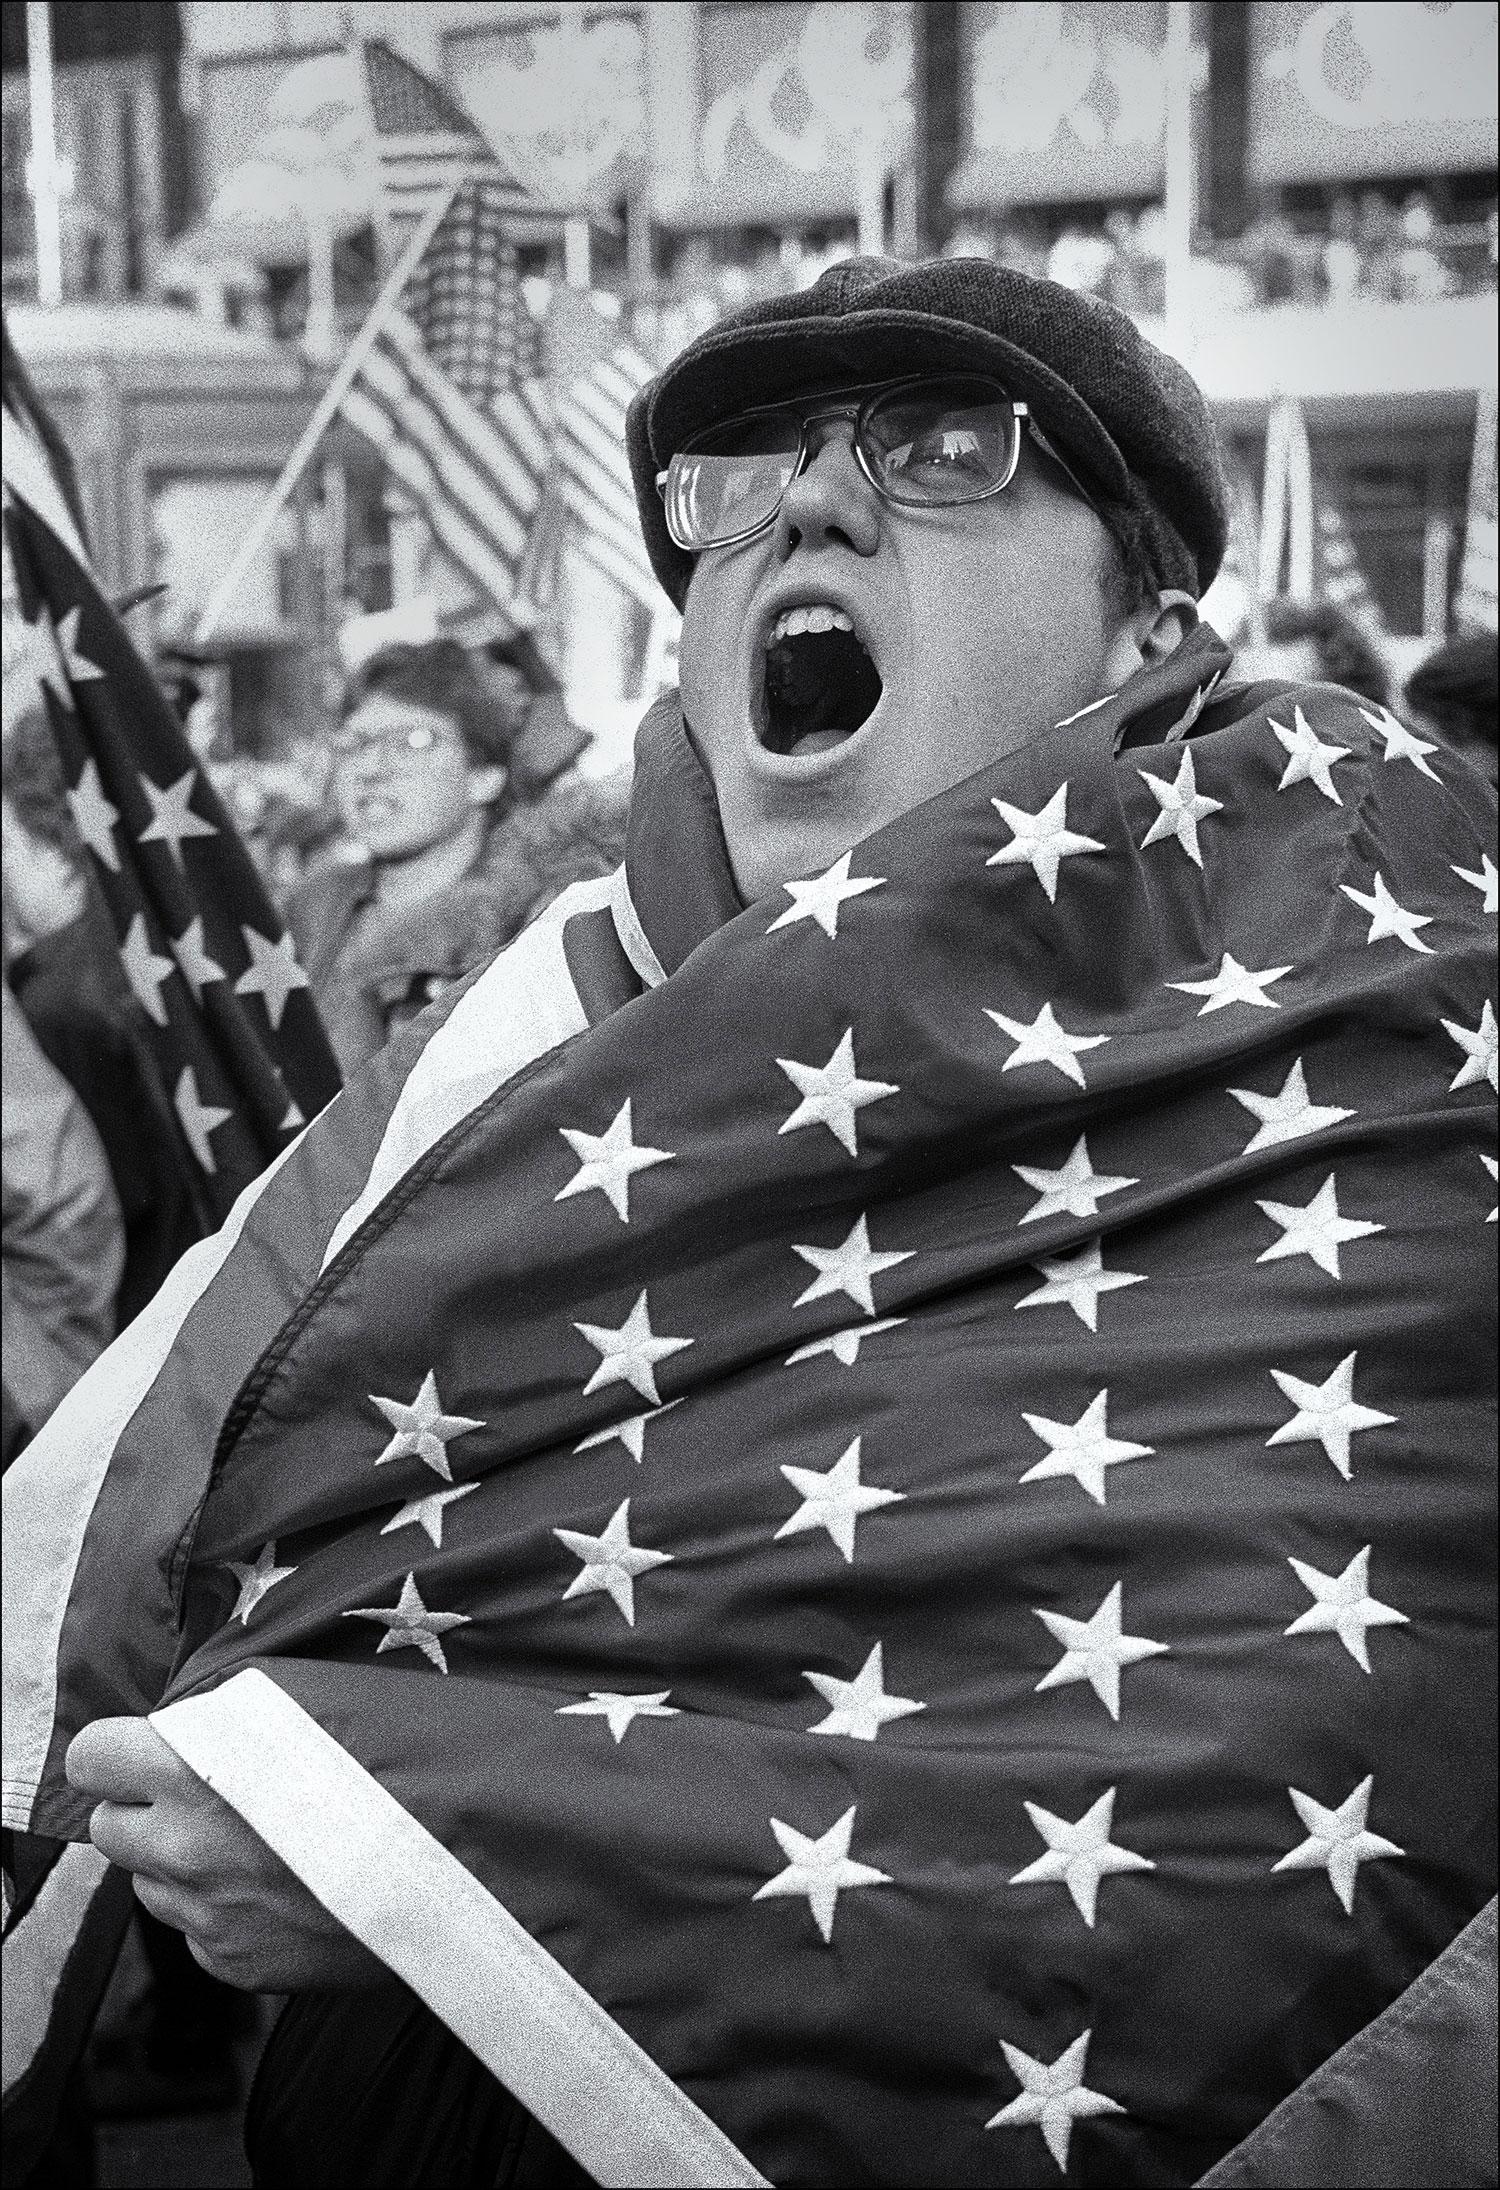 Pro-war-demonstrator_2.jpg